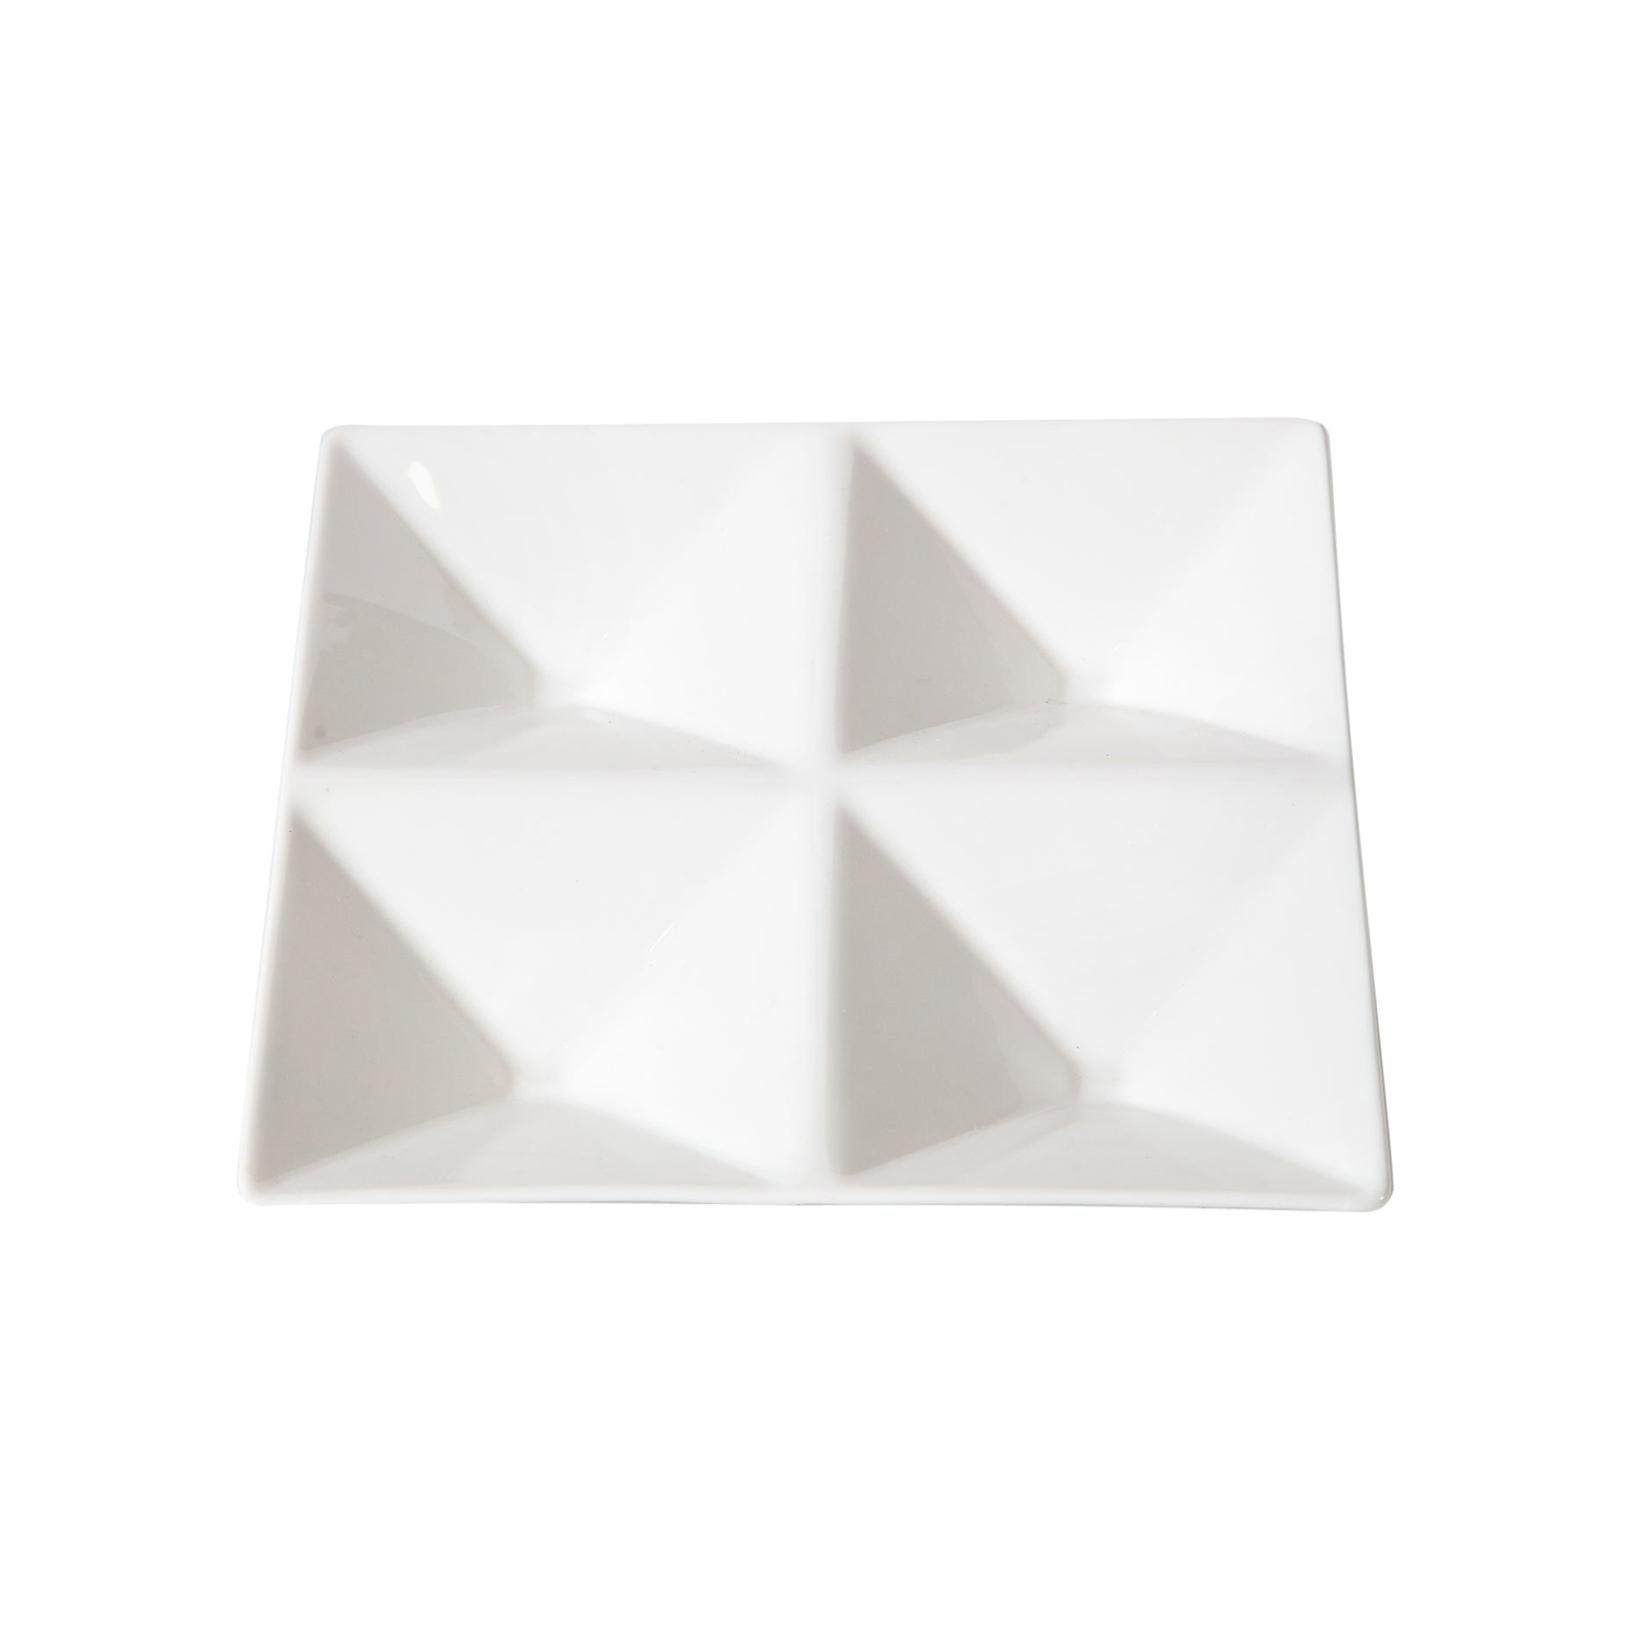 Tray, Arabia, Finland, White Porcelain, Scandinavian, Contemporary, in Stock